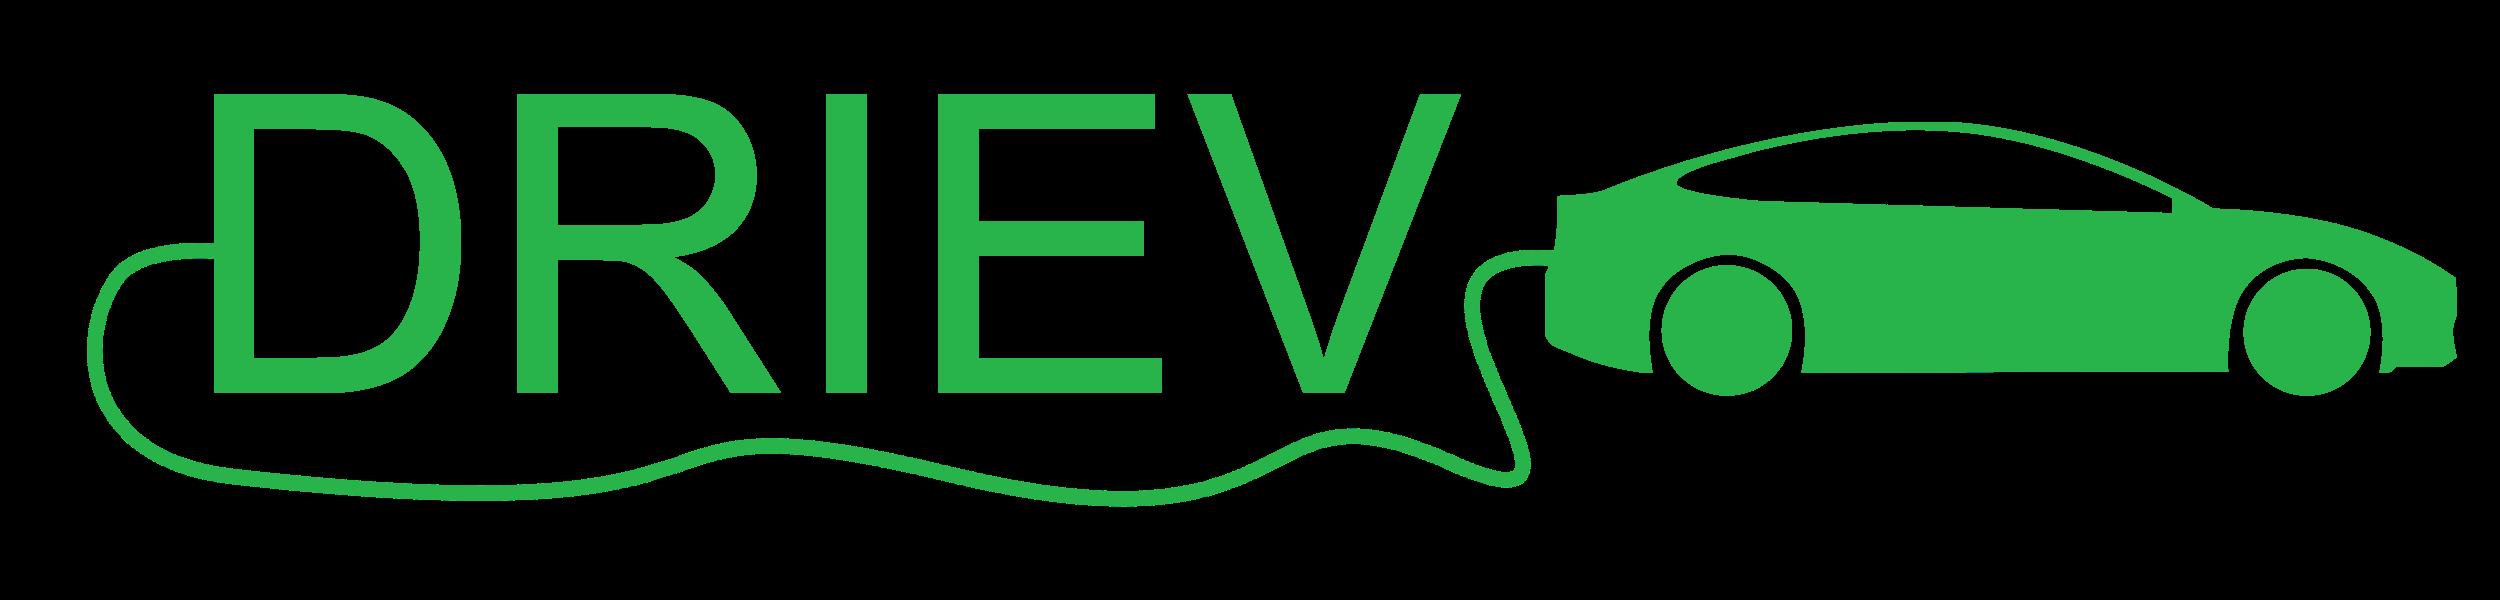 Driev - Drive EV